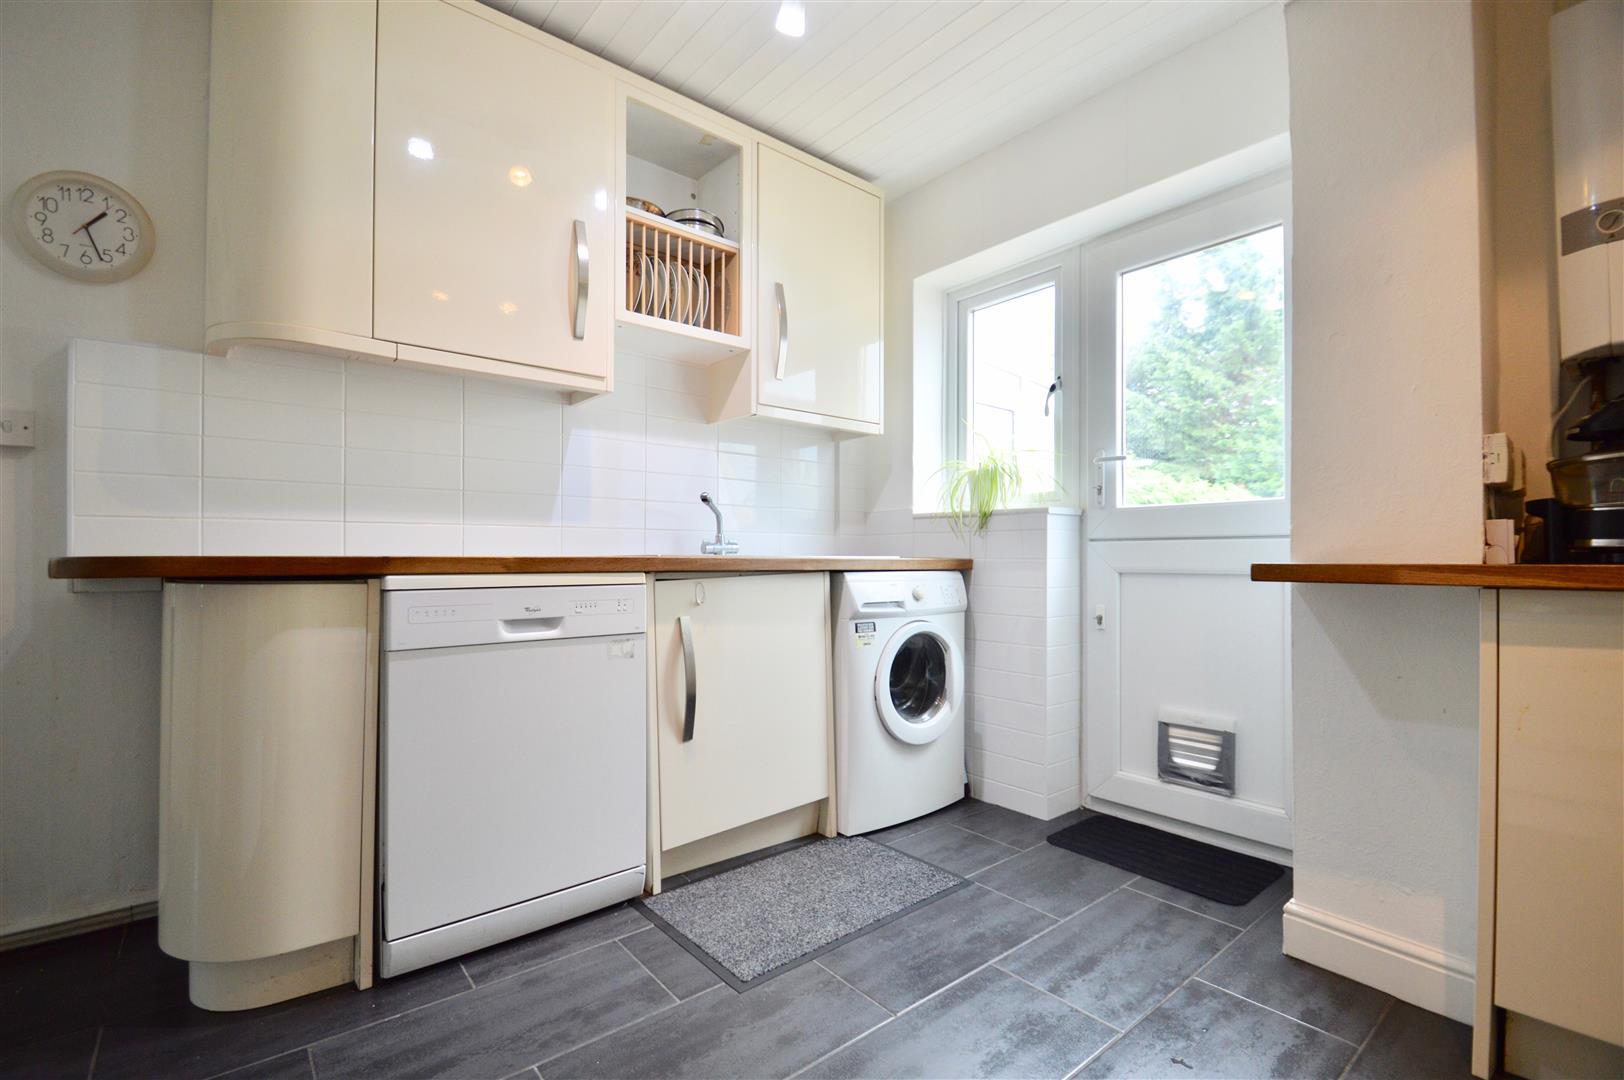 Property in Valley Drive, Gravesend, Kent, DA12 5RR